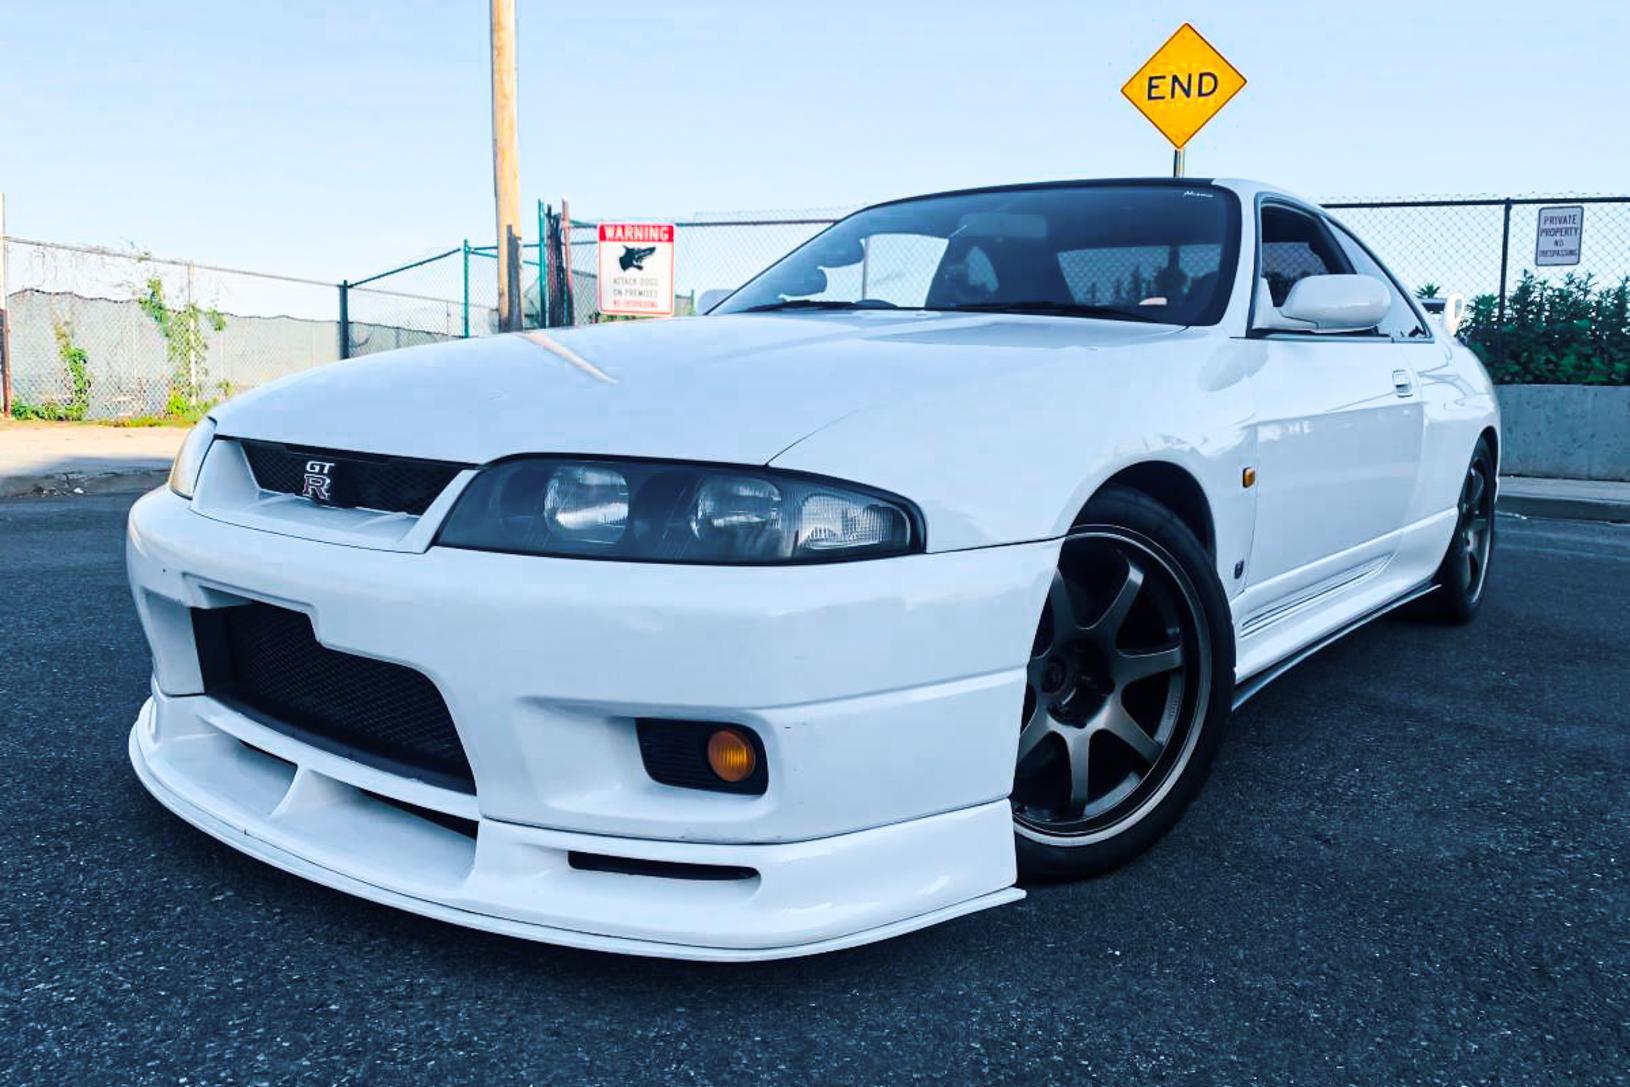 1996 Nissan Skyline GT-R